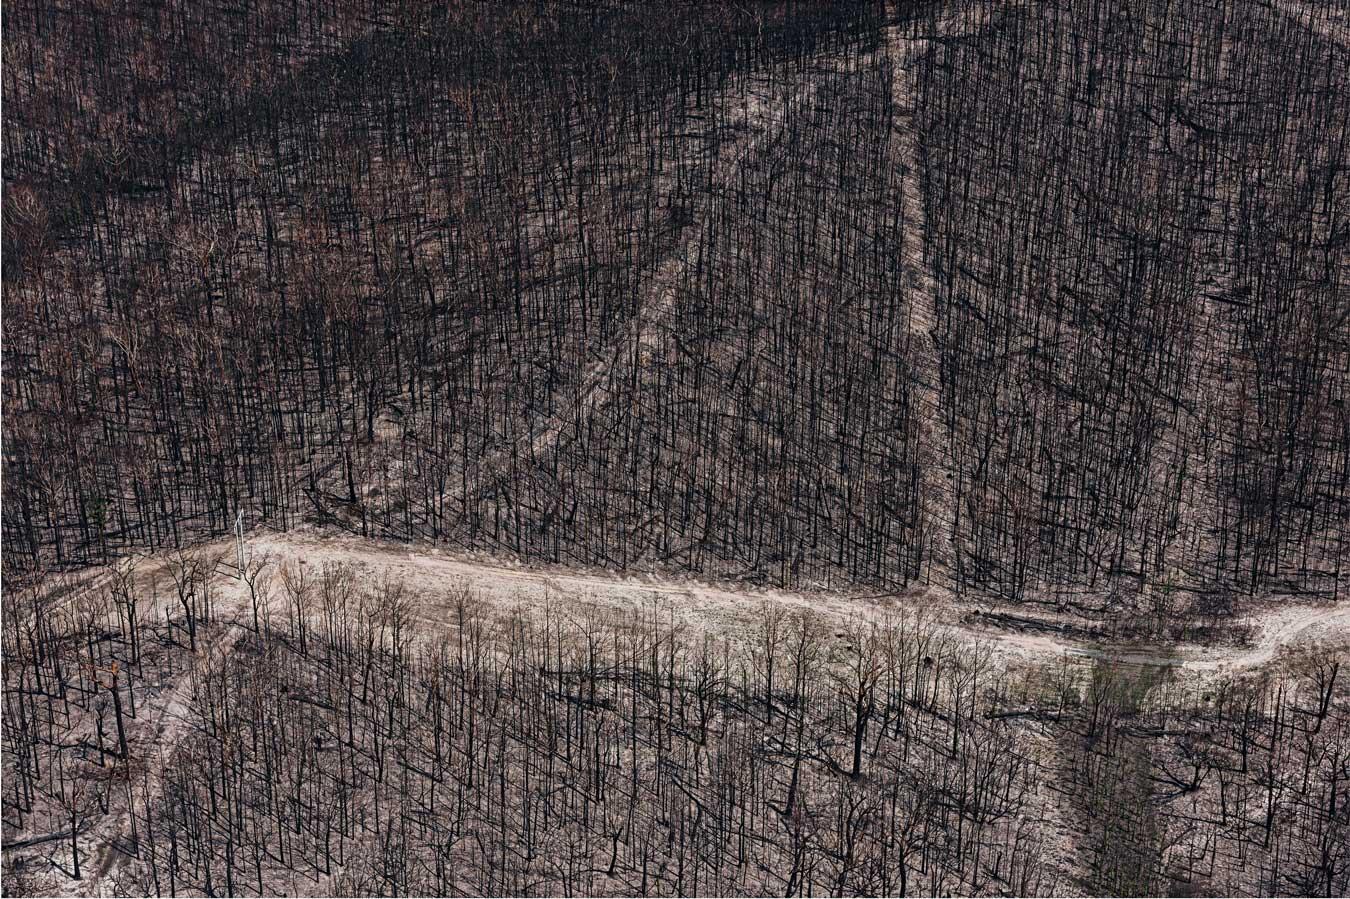 arial-shot-of-burnt-bushland-near-lake-conjola-by-james-brickwood.